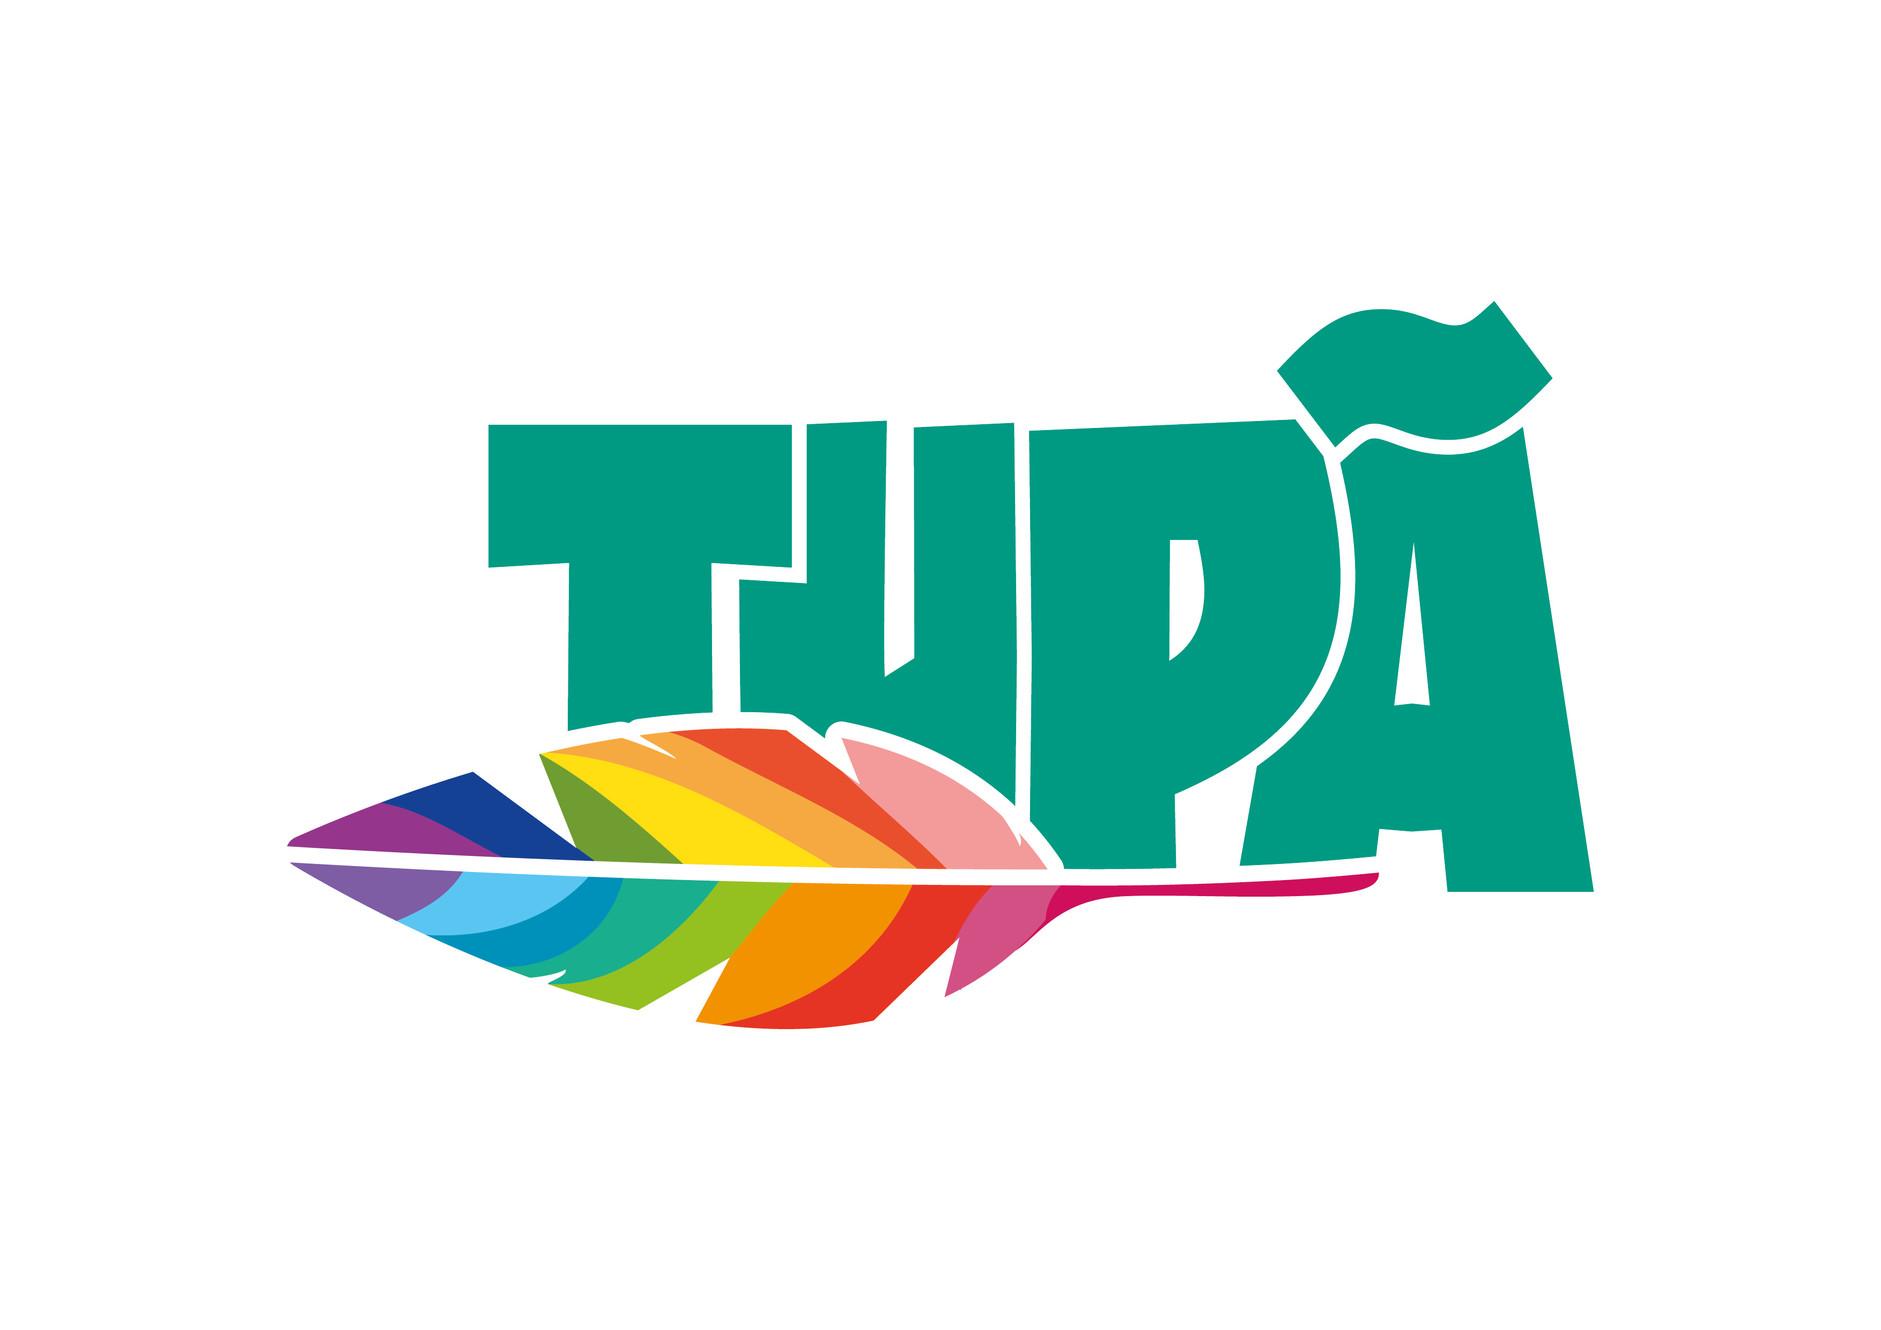 (c) Tupaembalagens.com.br